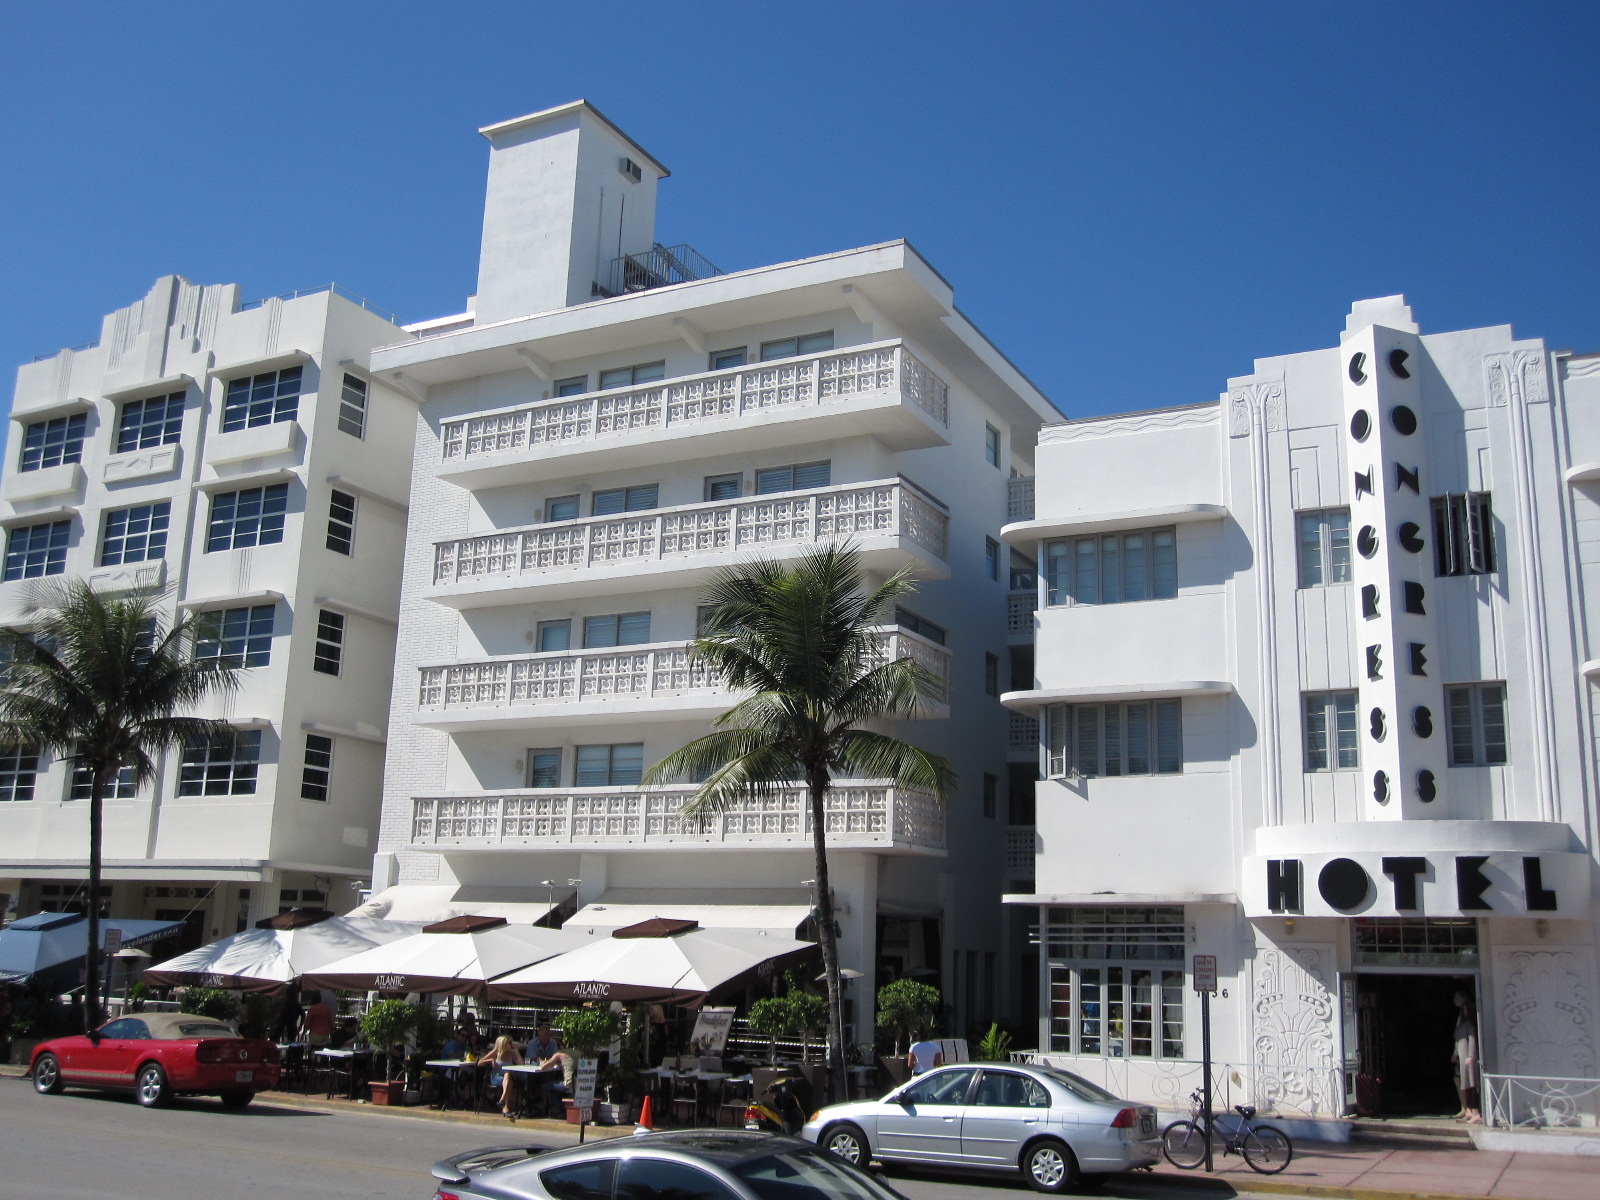 Art Deco Dominates The South Beach Area